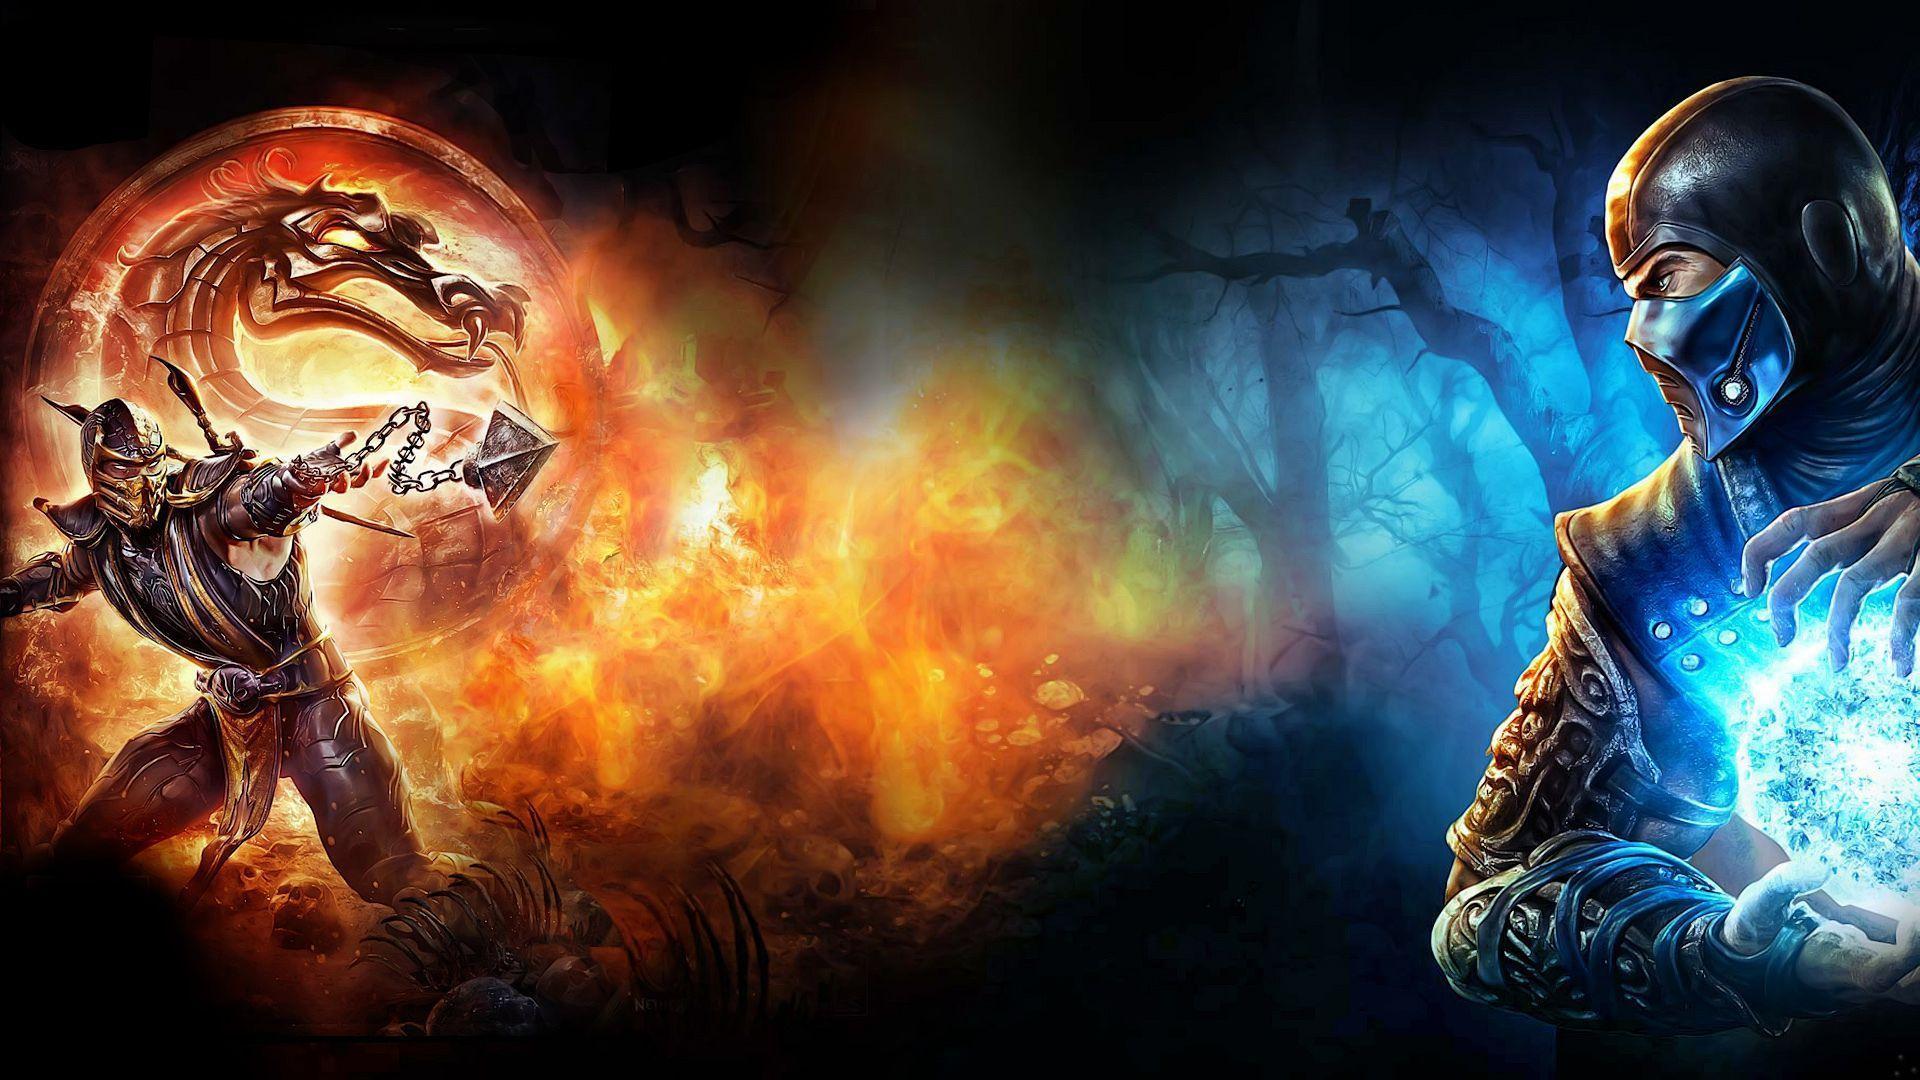 Warner Bros. убрали Mortal Kombat: Komplete Edition с продажи